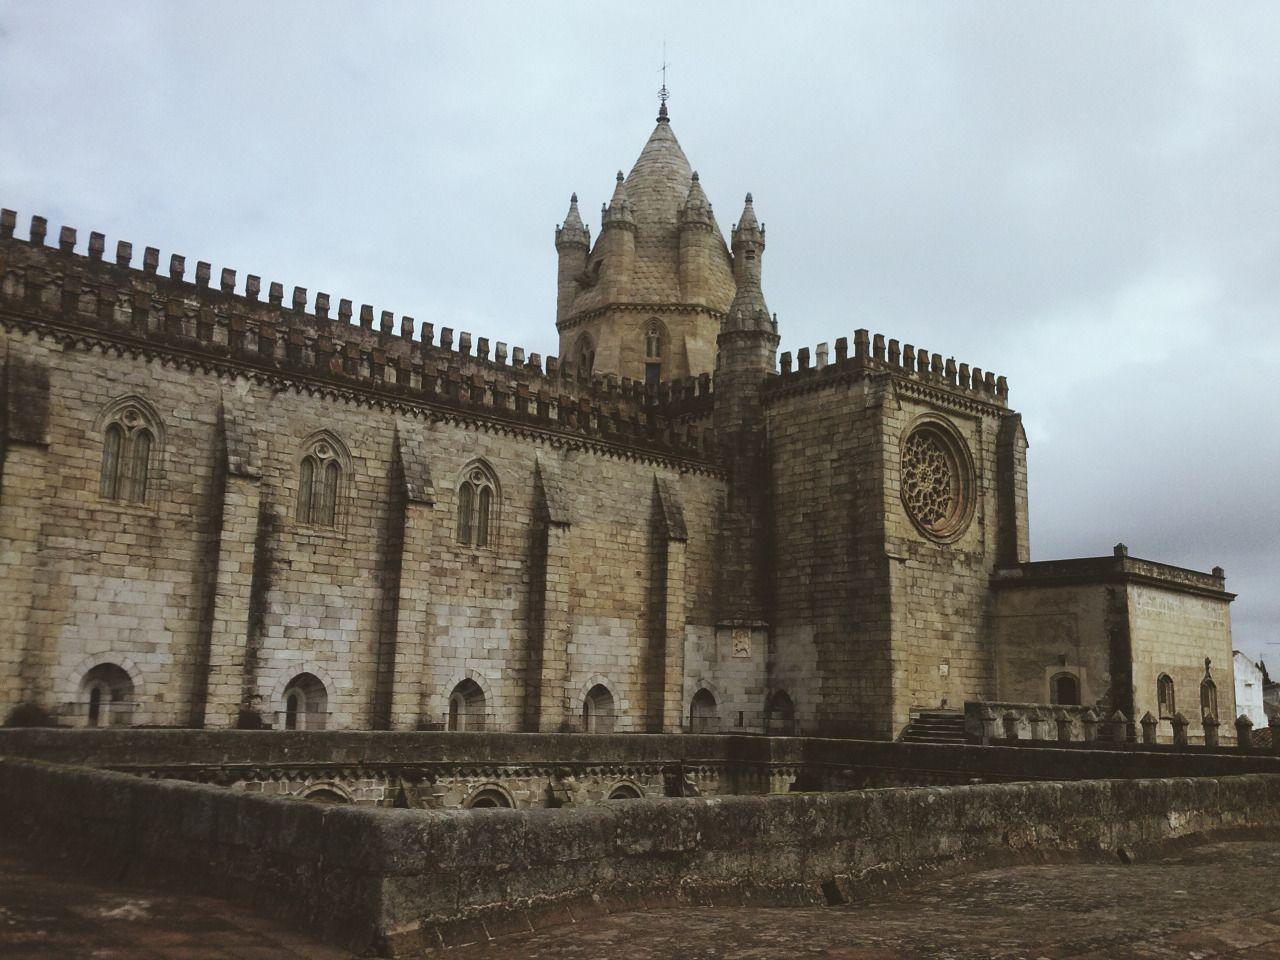 Sé Catedral, Évora